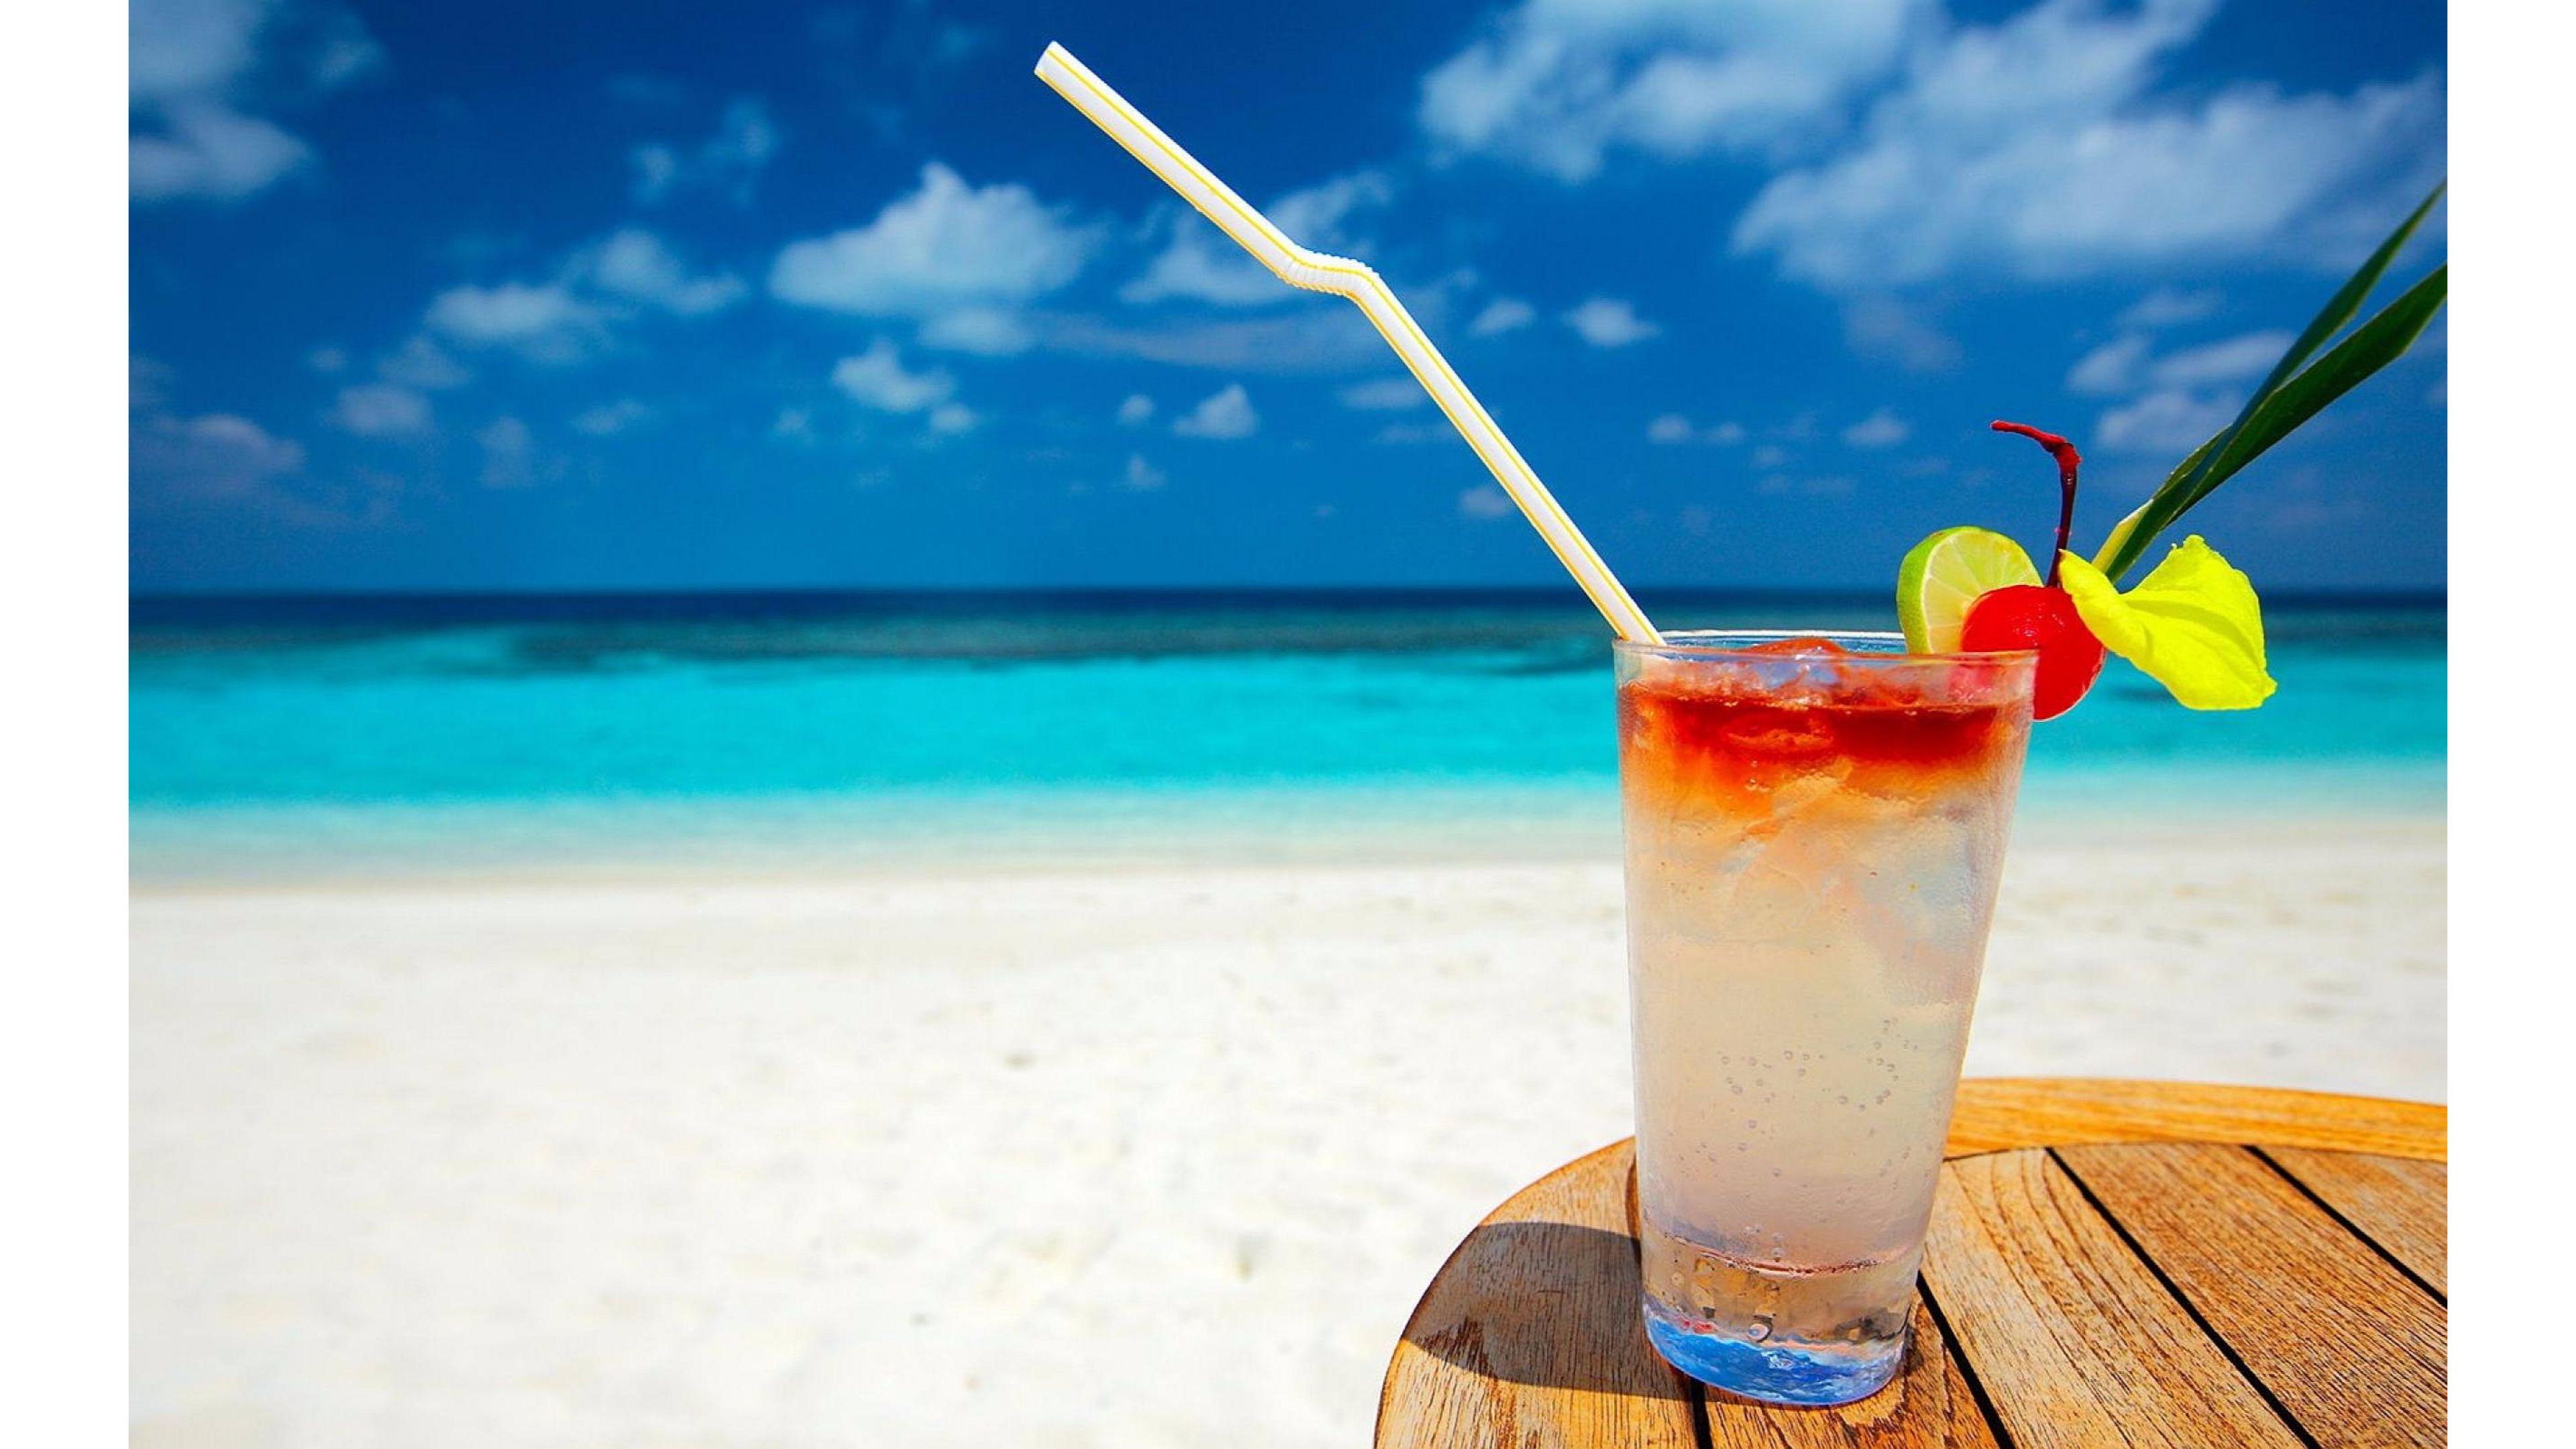 Tropical Paradise Beach 4k Hd Desktop Wallpaper For 4k: Tropical Wallpapers, Photos And Desktop Backgrounds Up To